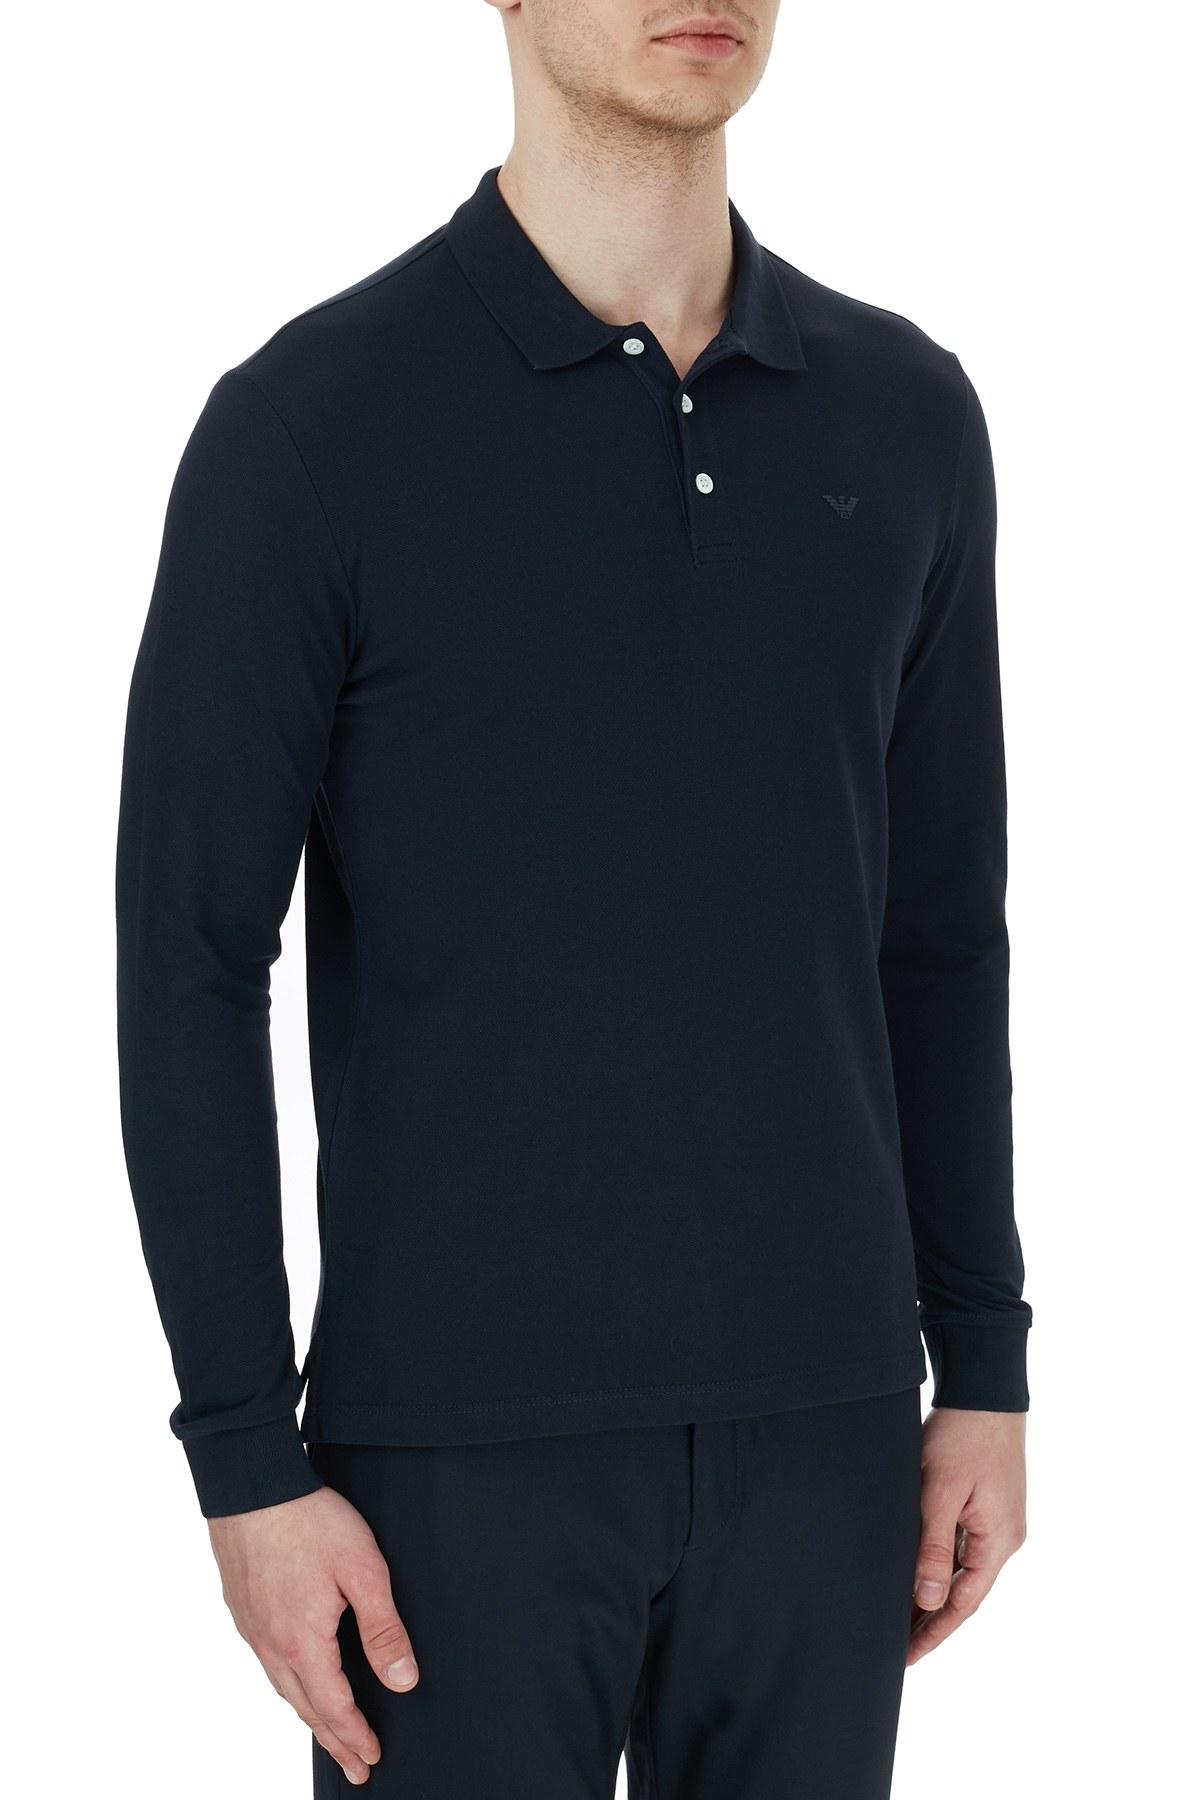 Emporio Armani % 100 Pamuk Düğmeli T Shirt Erkek Polo 8N1F13 1J0SZ 0939 LACİVERT